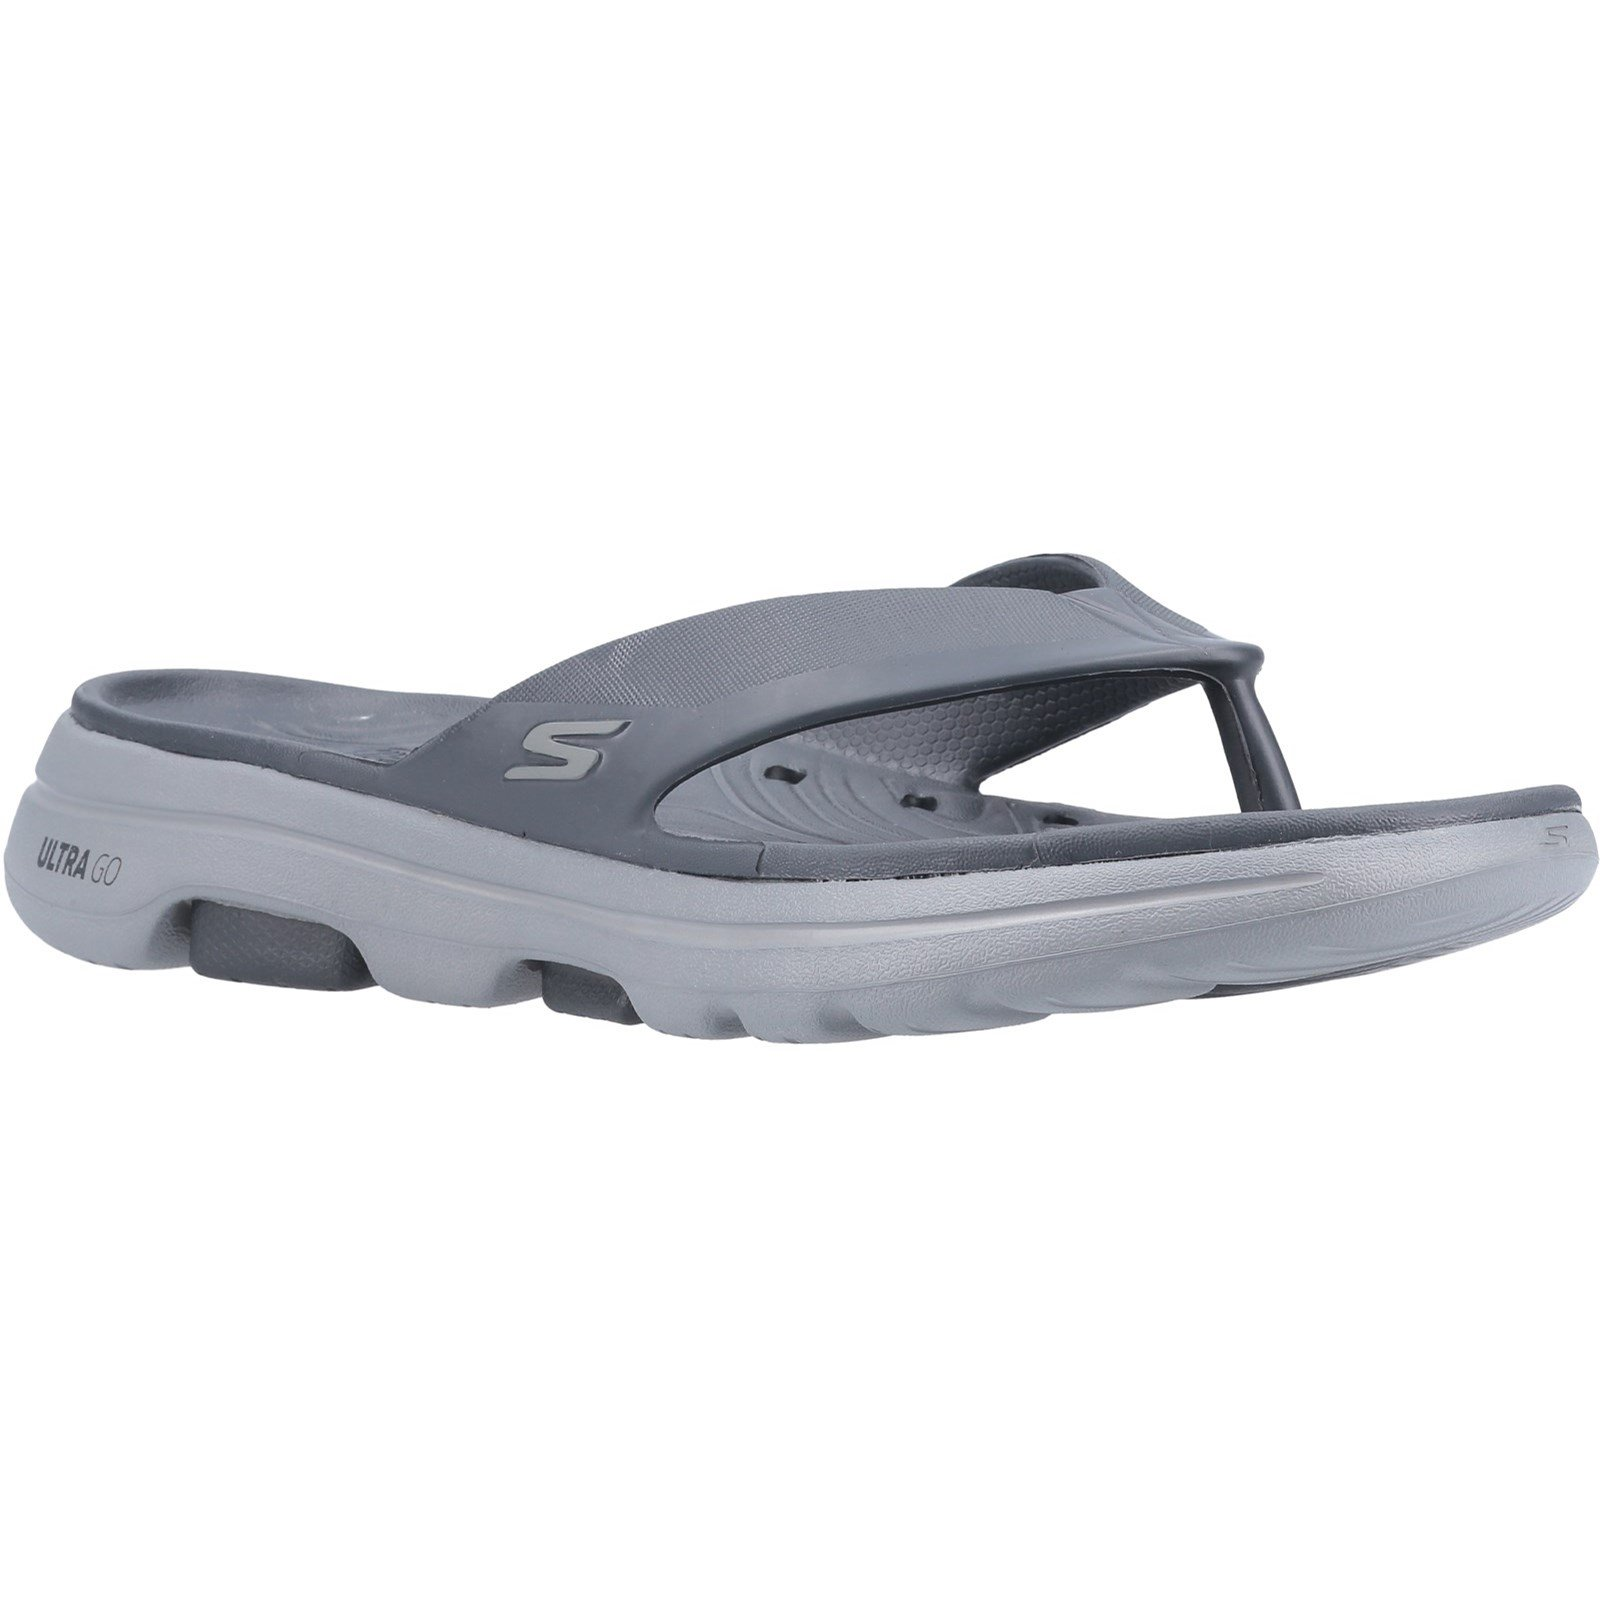 Skechers Men's GOwalk 5 Cabana Toe Post Sandal Charcoal 32207 - Charcoal 9